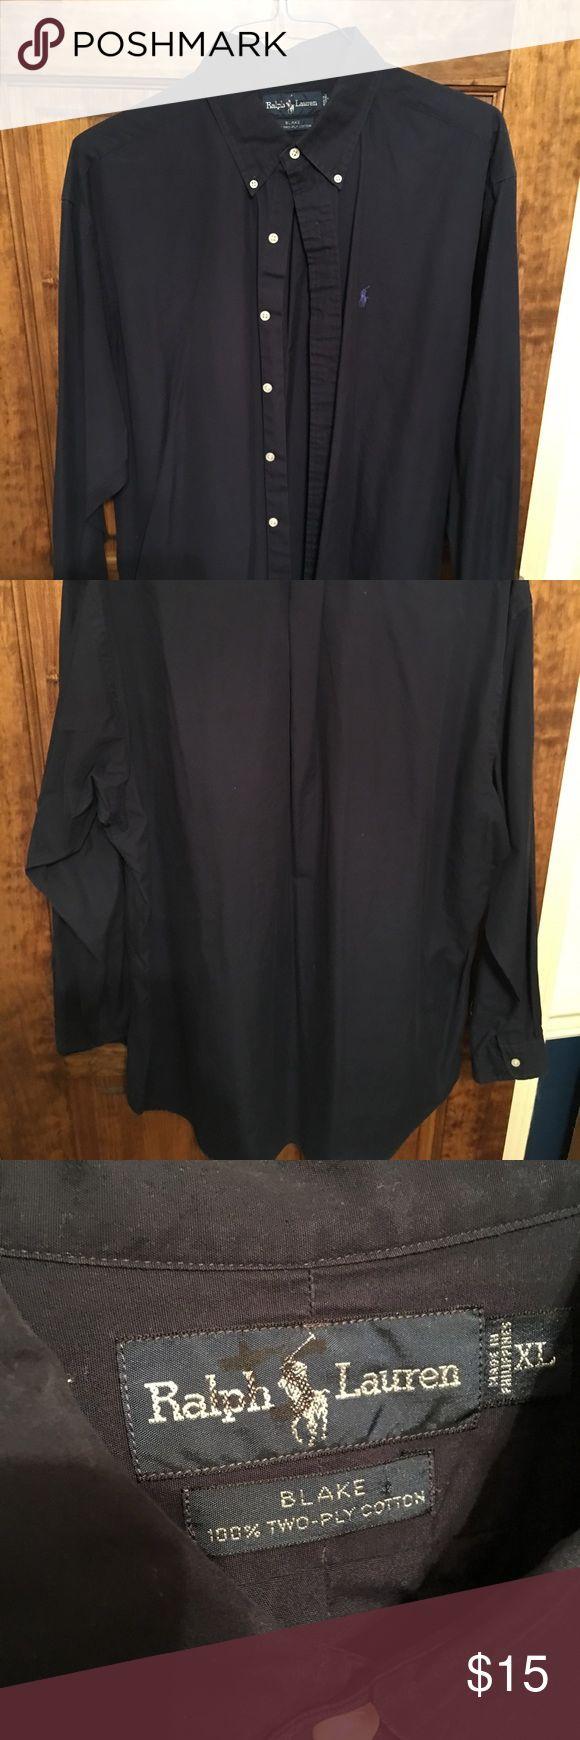 Long sleeve polo button down Navy long sleeve polo button down long sleeve shirt. Size XL Polo by Ralph Lauren Shirts Casual Button Down Shirts